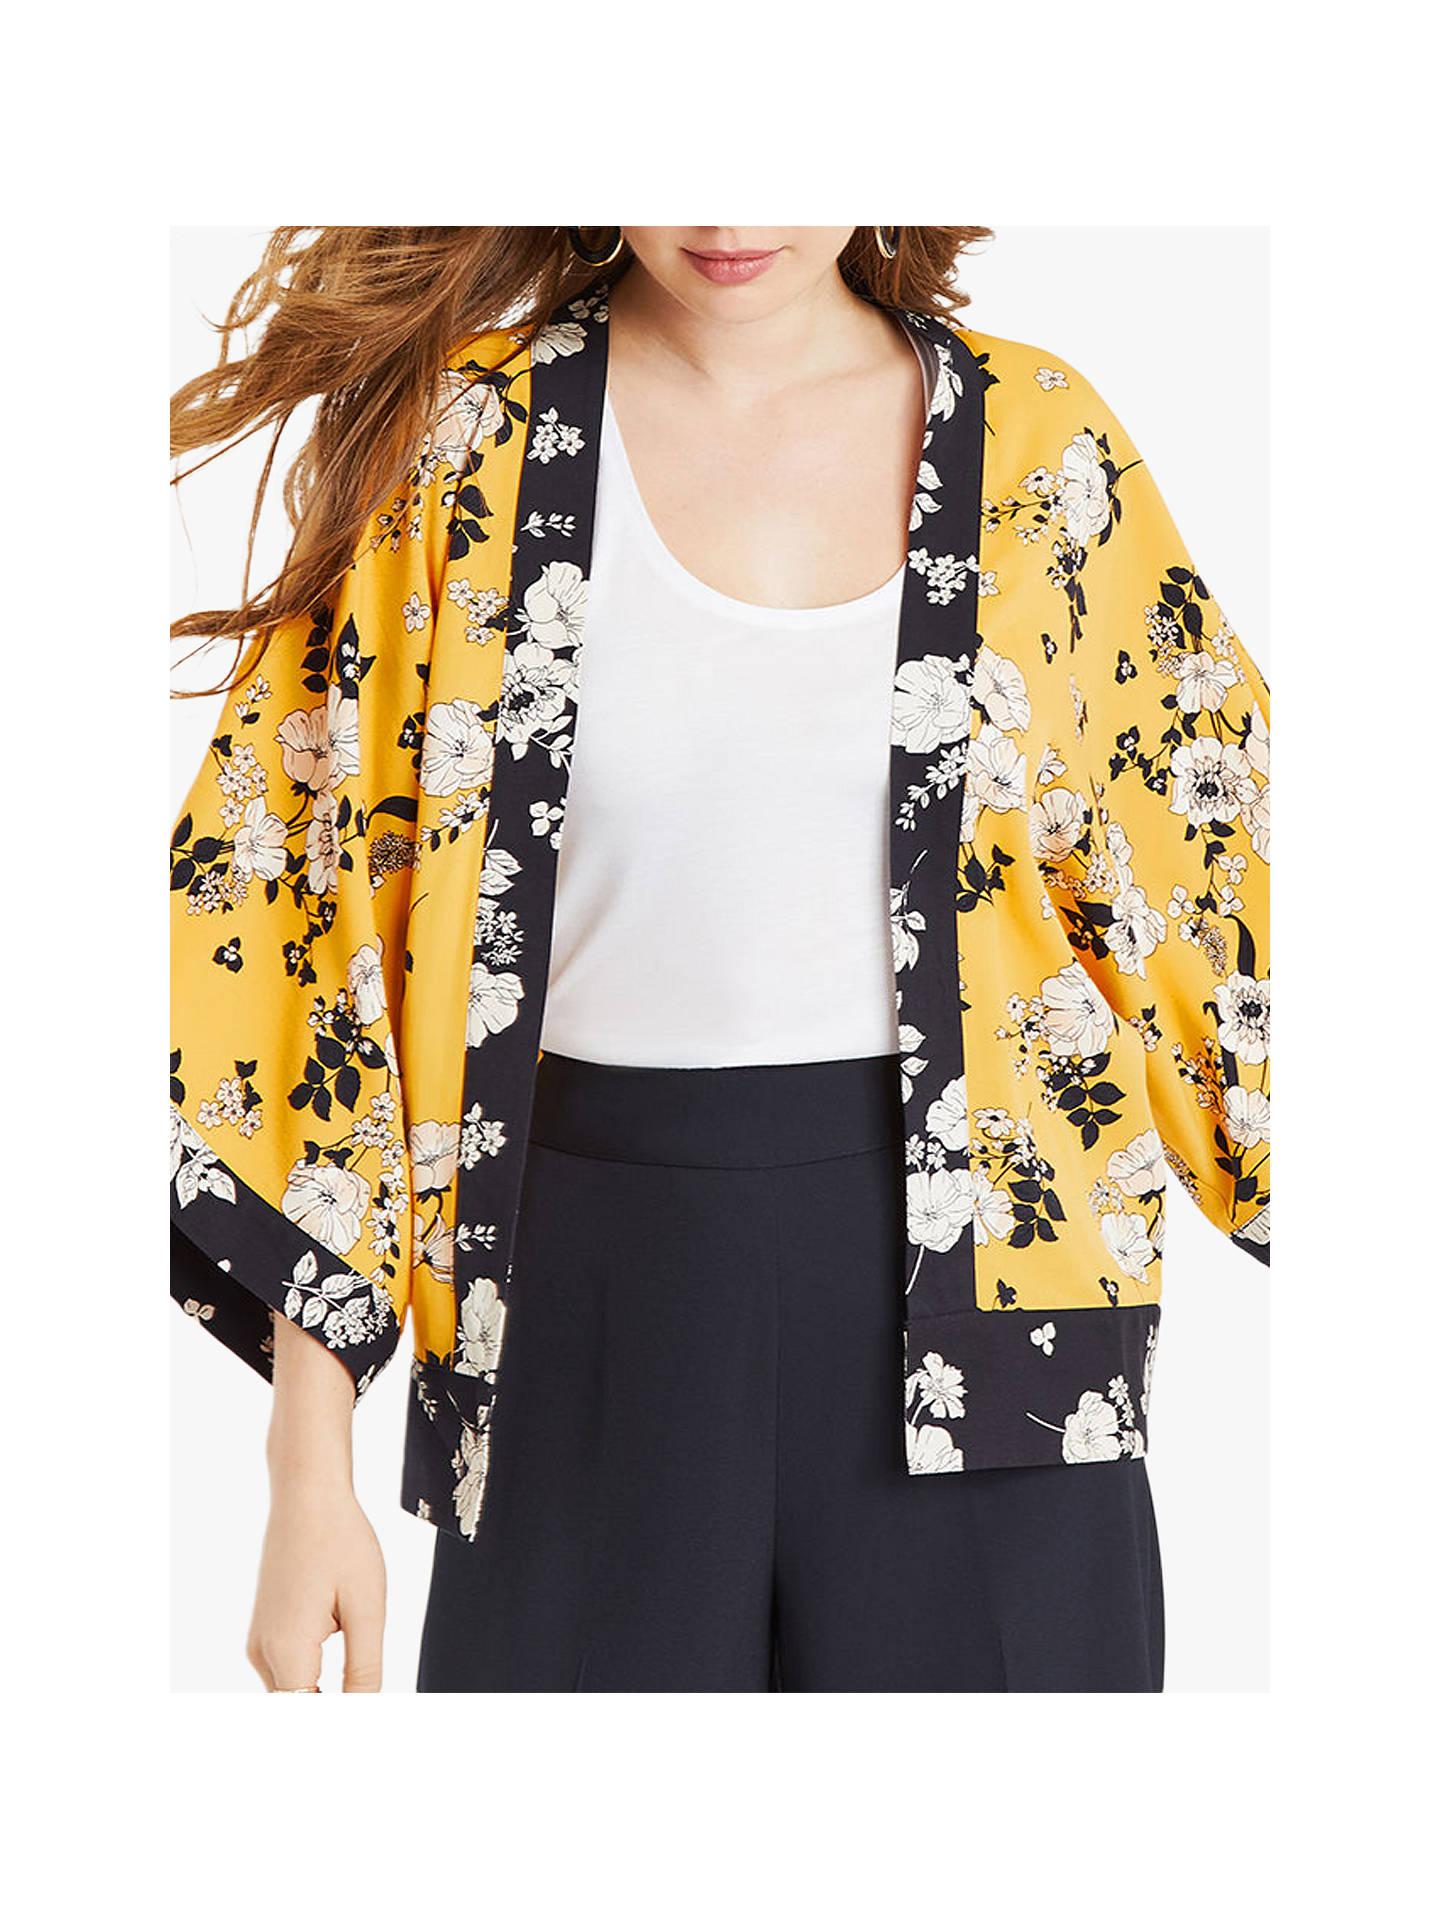 499ef9e82b0f Buy Oasis Scarf Print Kimono Jacket, Multi Yellow, 24 Online at  johnlewis.com ...